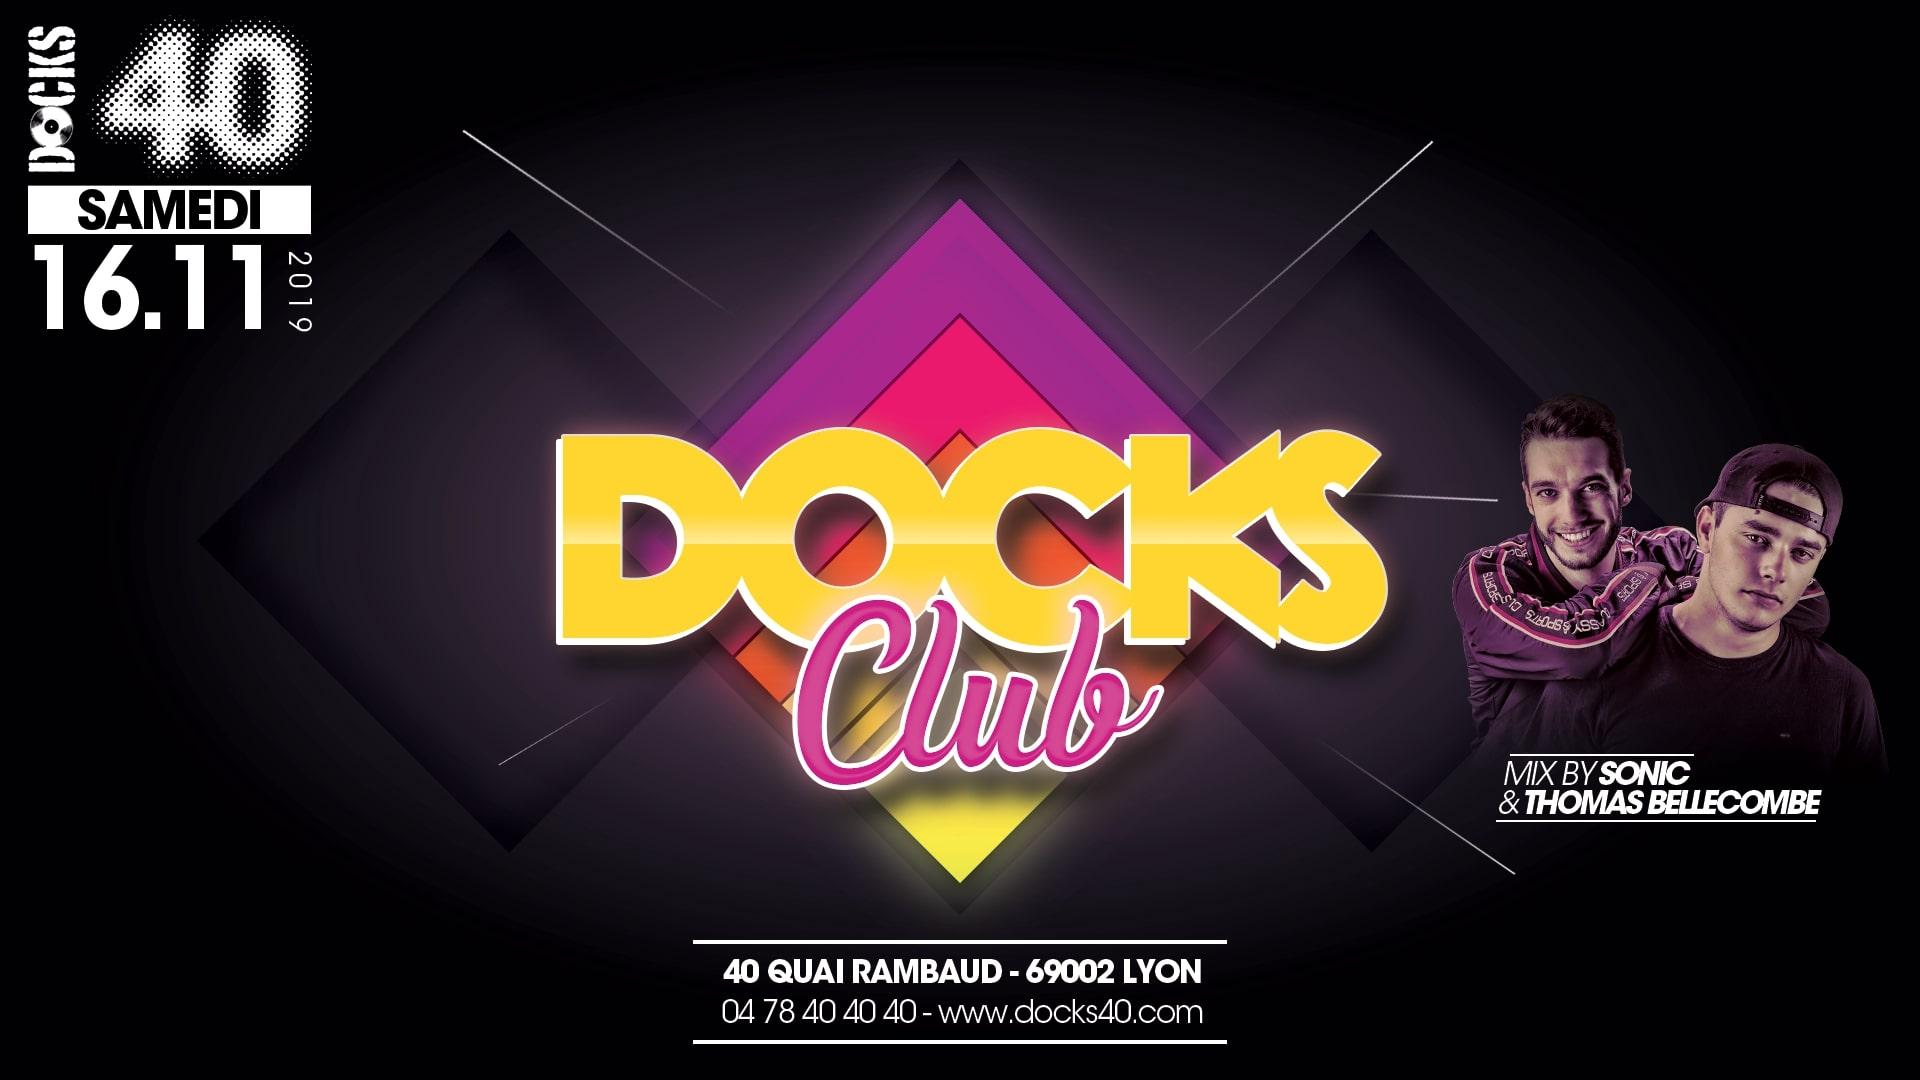 Docks Club